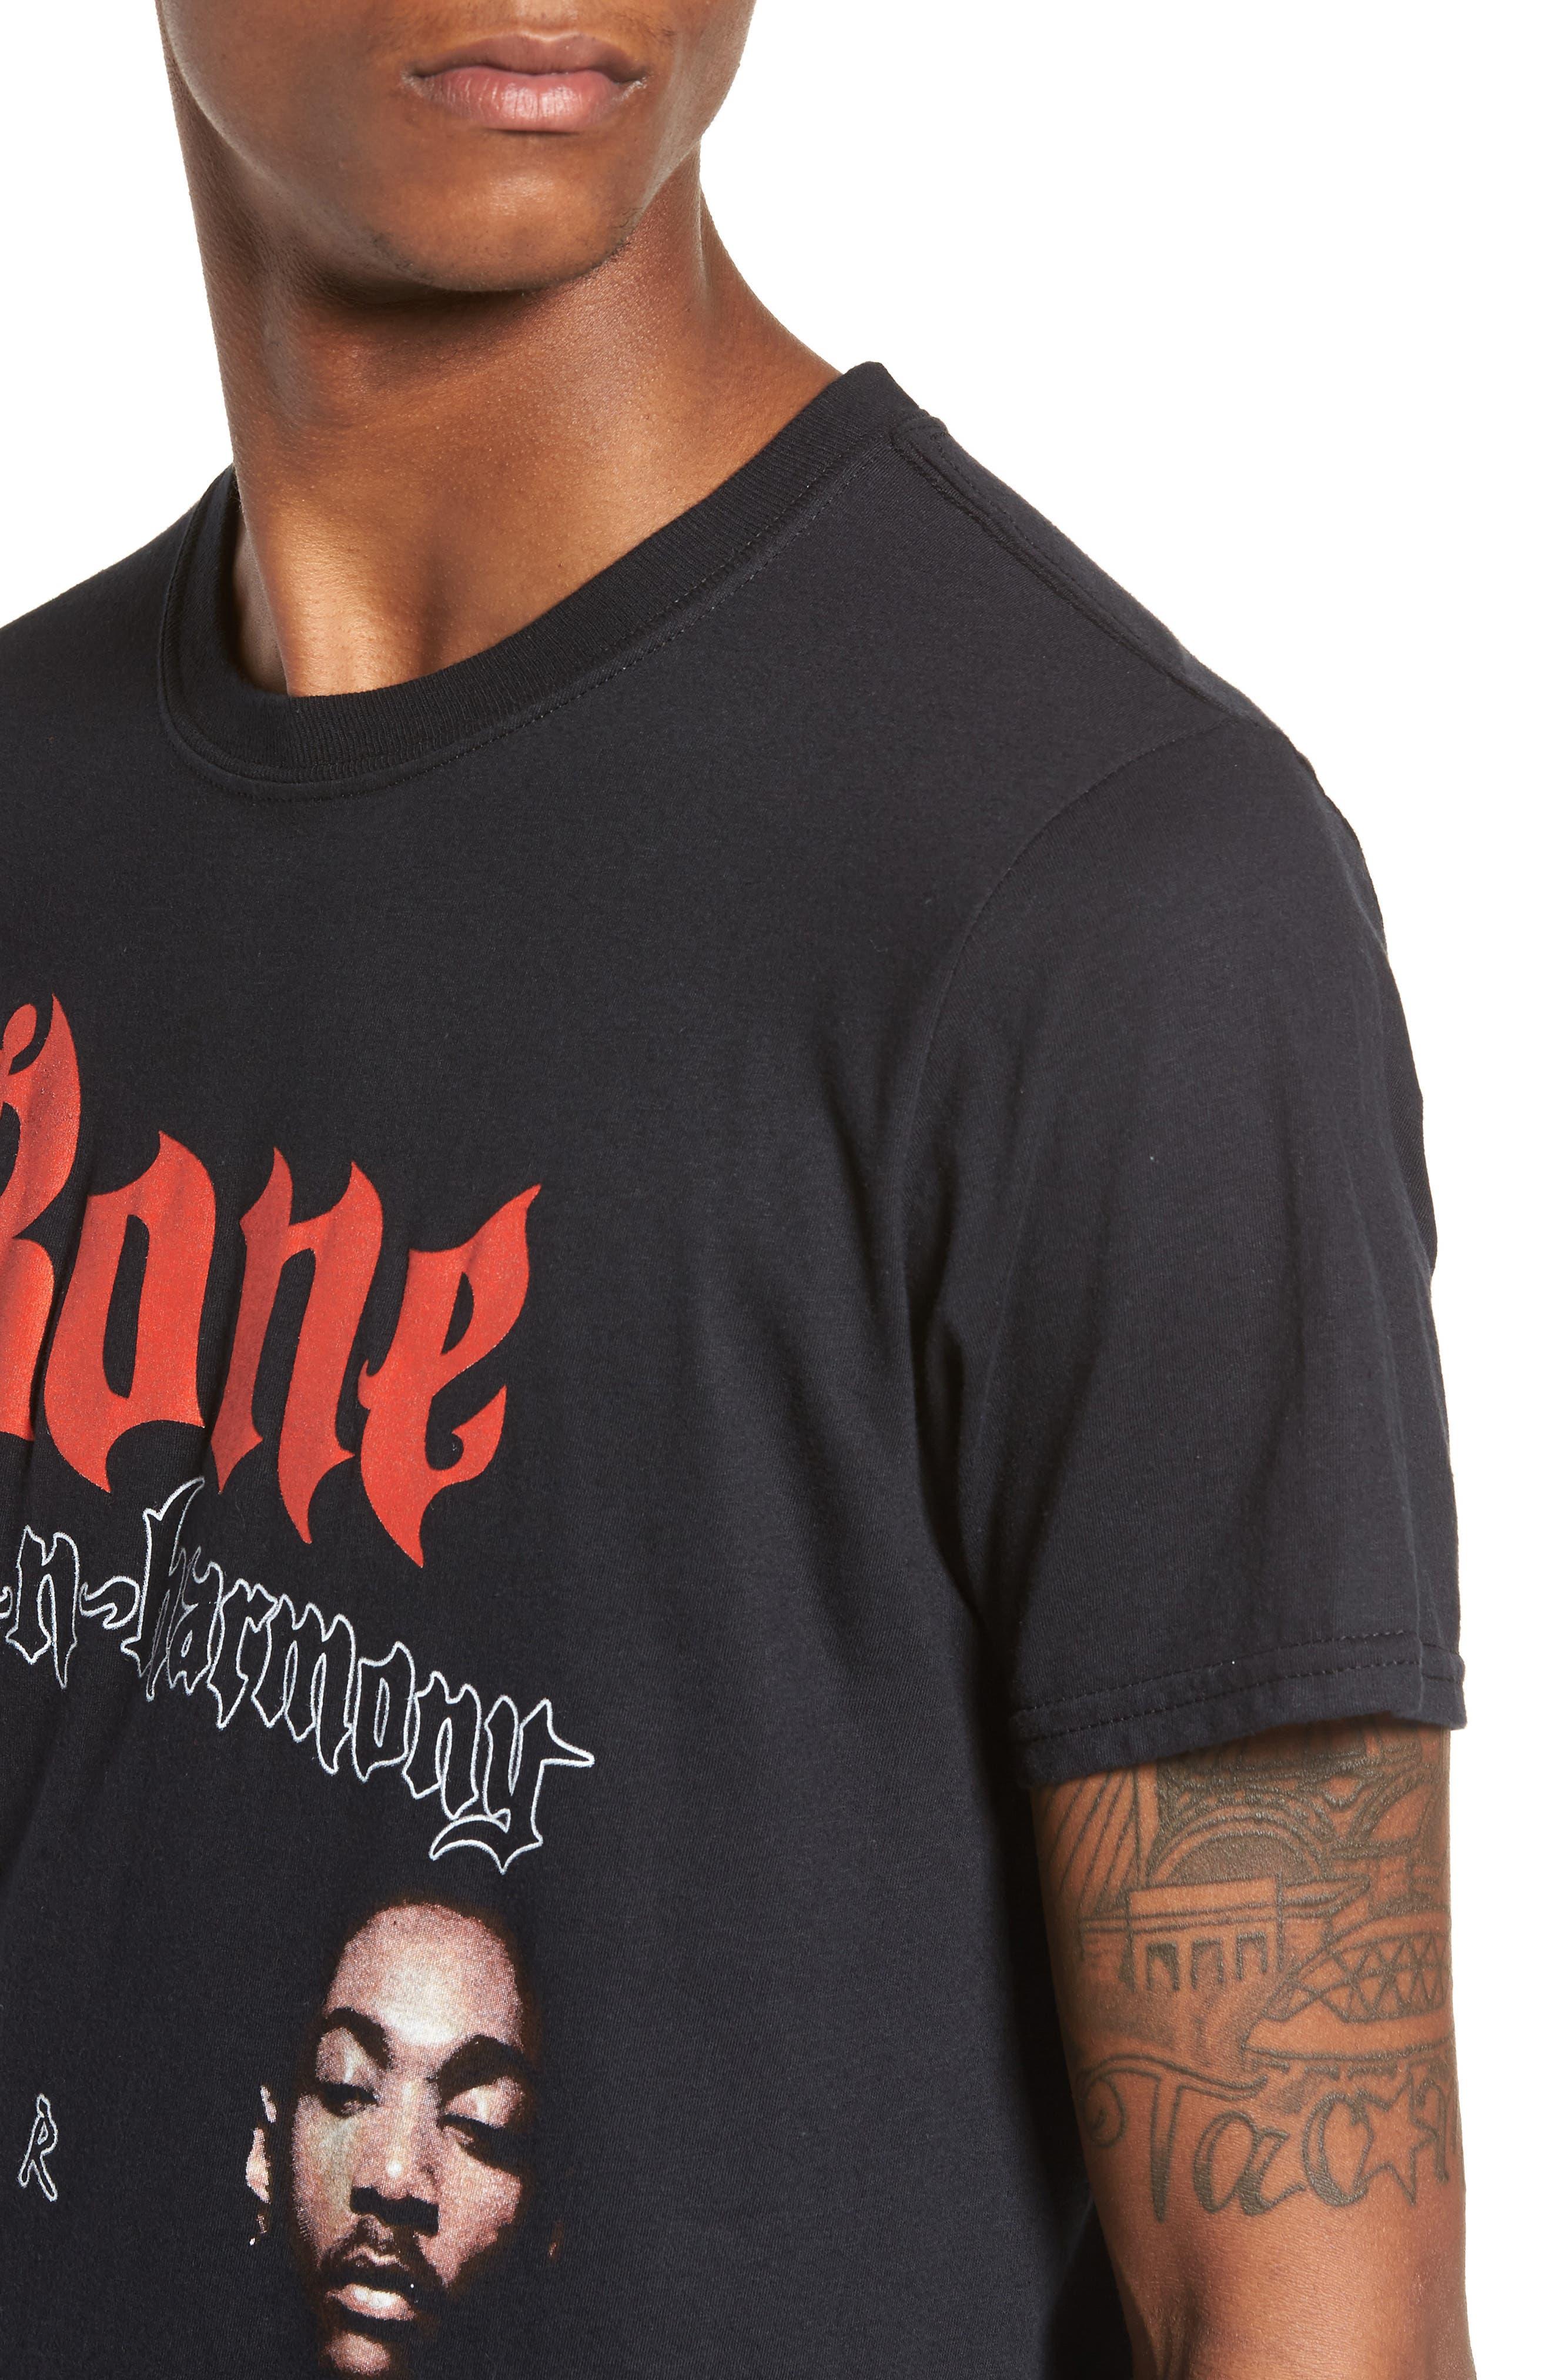 Bone Thugs-n-Harmony T-Shirt,                             Alternate thumbnail 4, color,                             Black Tee Bone Thugs